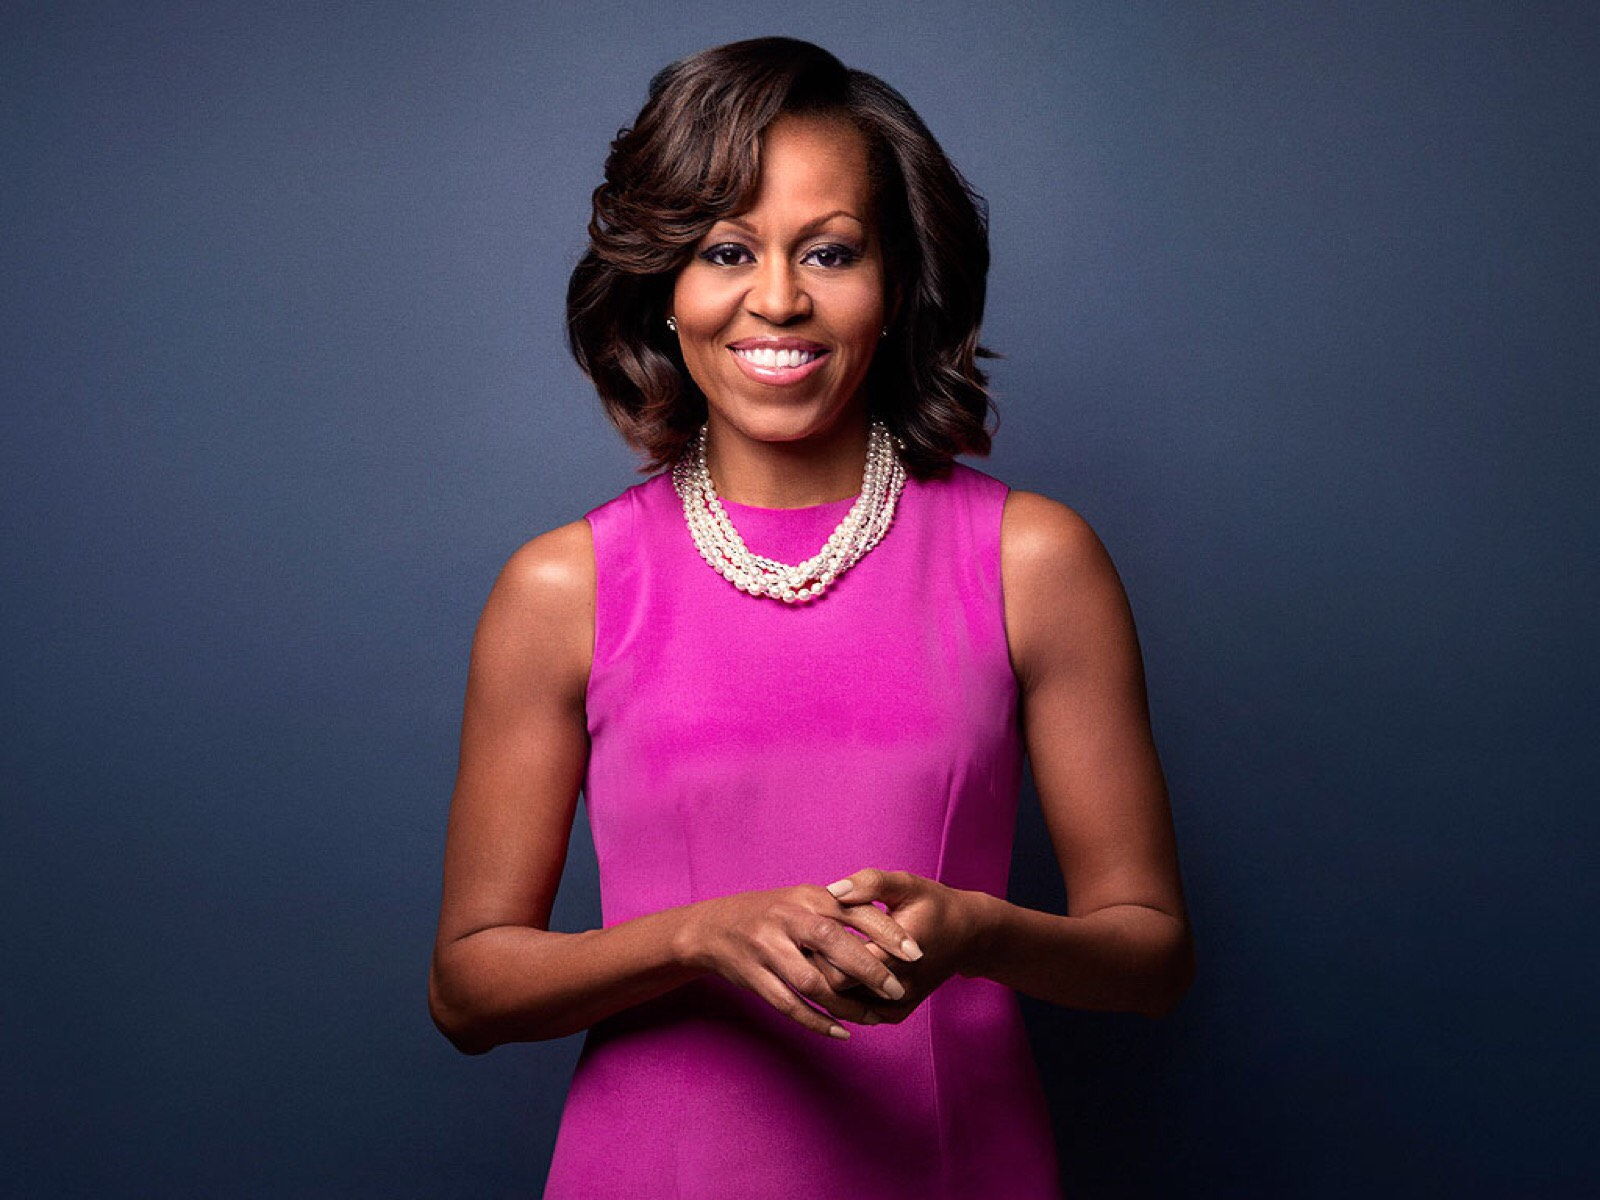 Image of Michelle Obama.